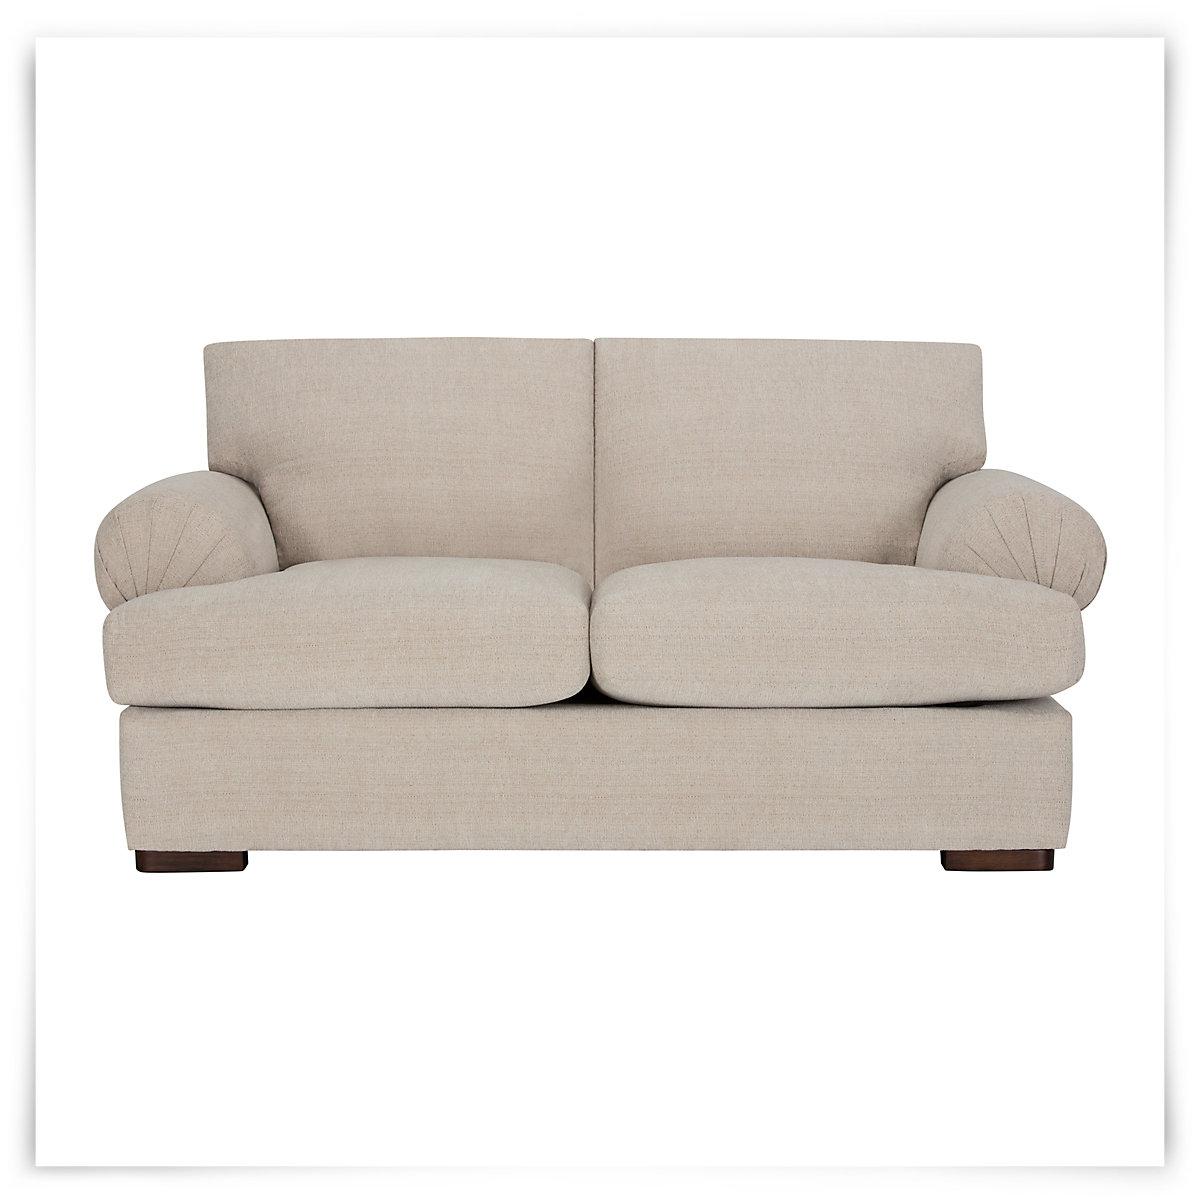 City Furniture Belair Lt Taupe Microfiber Loveseat